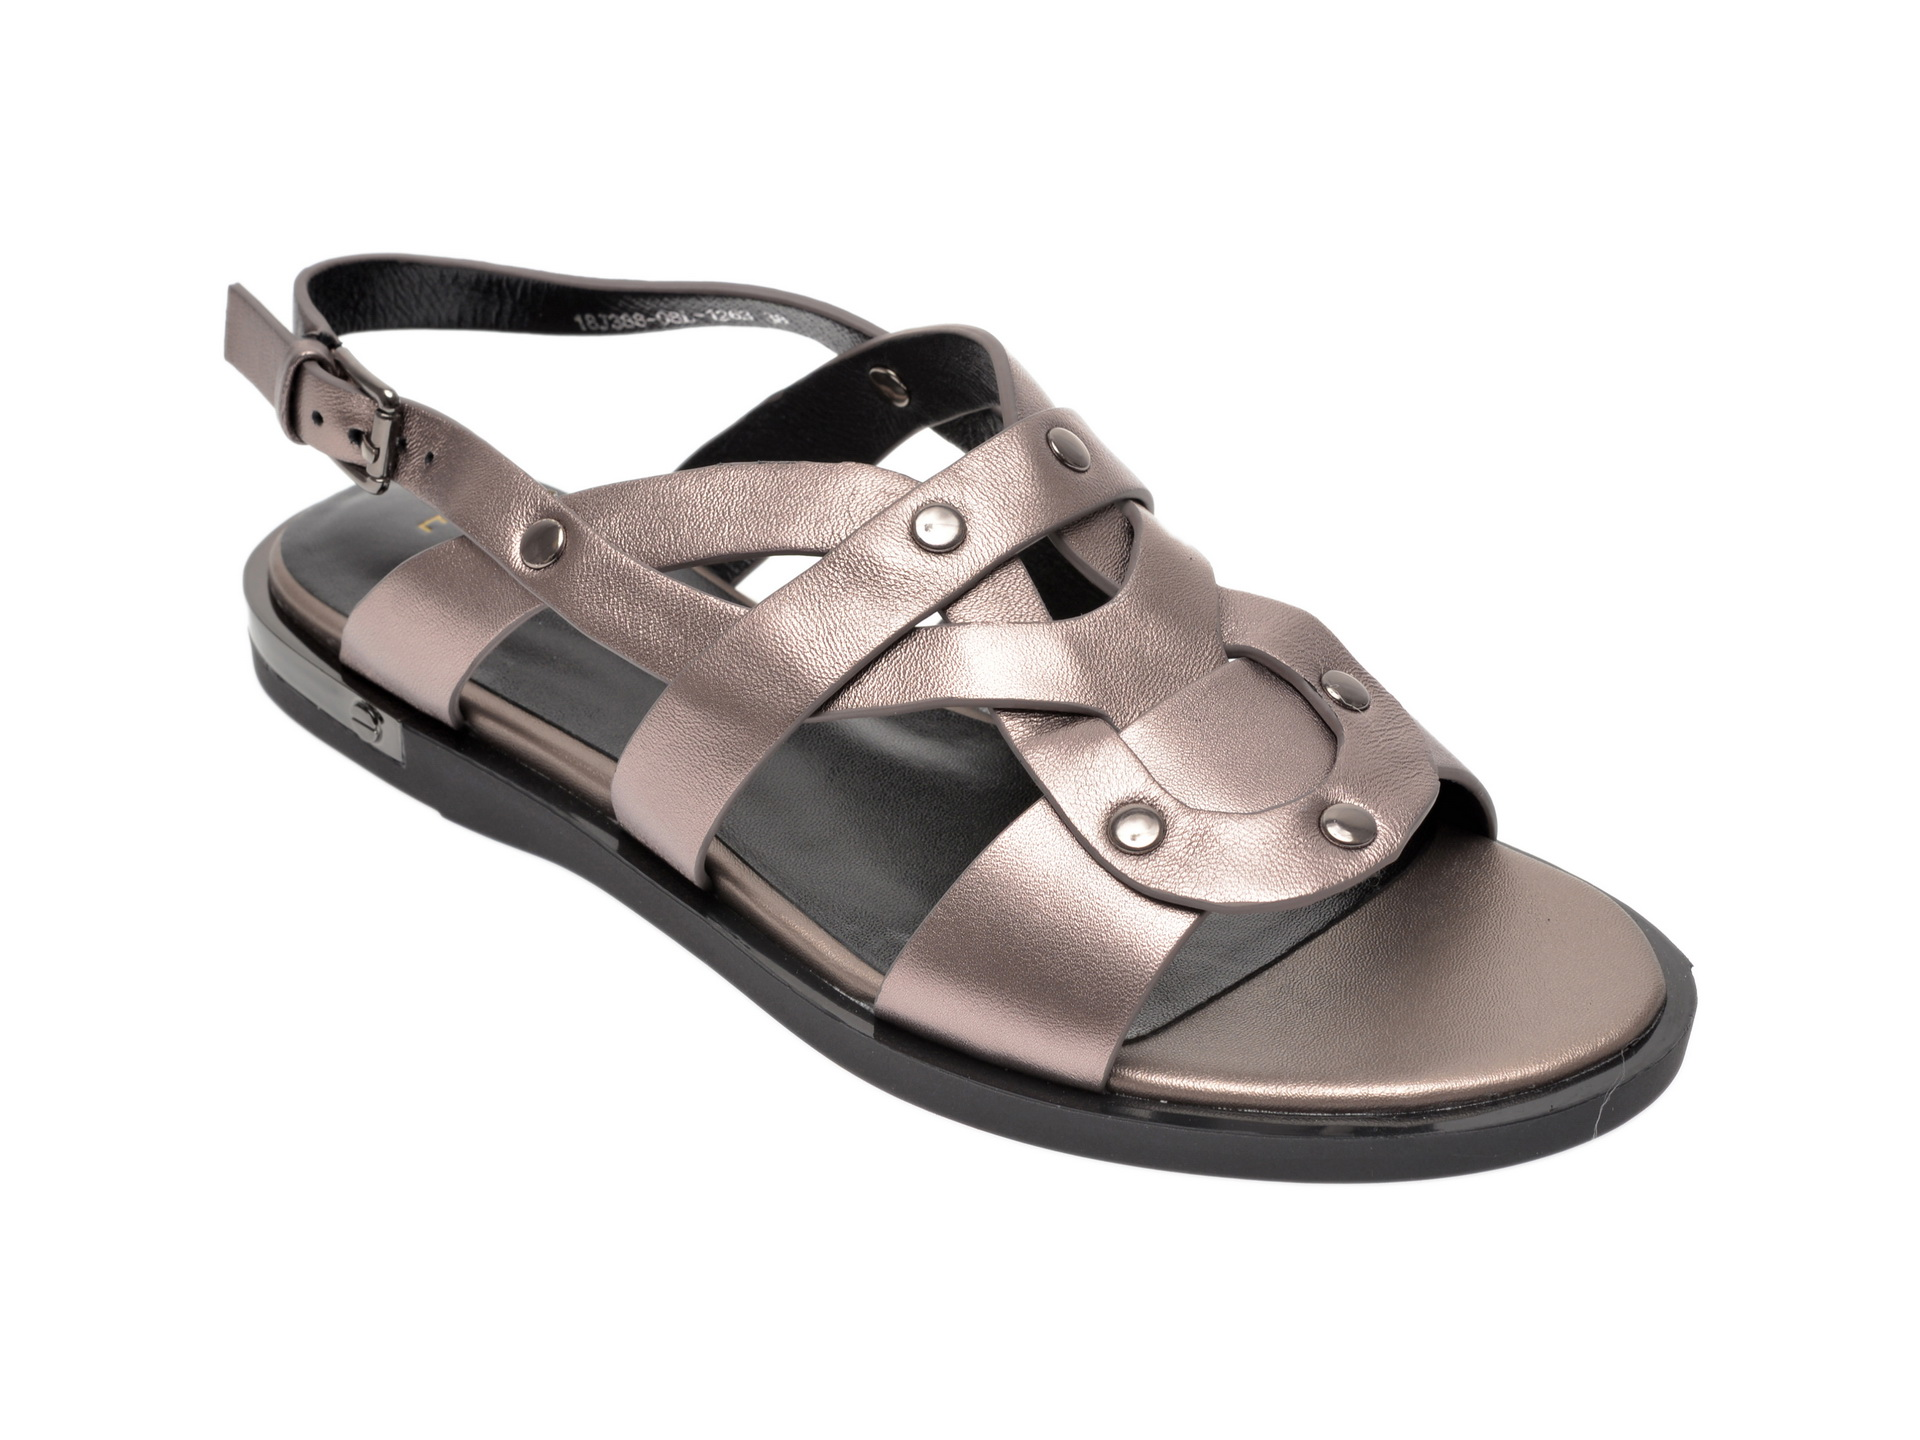 Sandale EPICA gri, 18J3880, din piele naturala